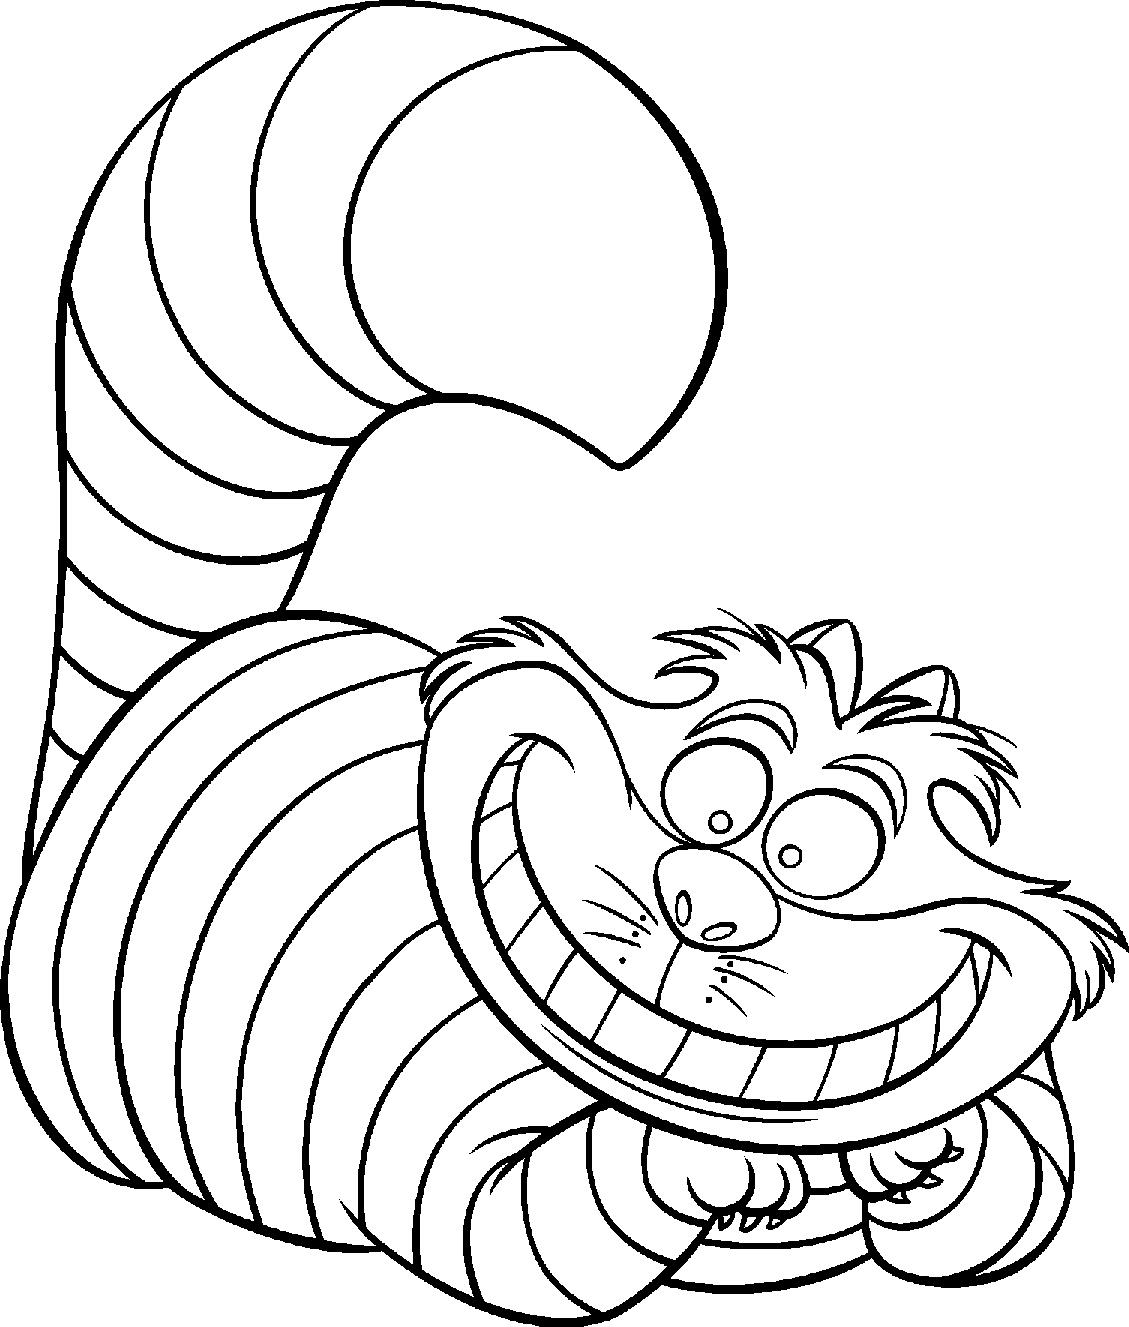 photo regarding Cheshire Cat Printable named Cheshire Cat Smile Drawing No cost obtain most straightforward Cheshire Cat